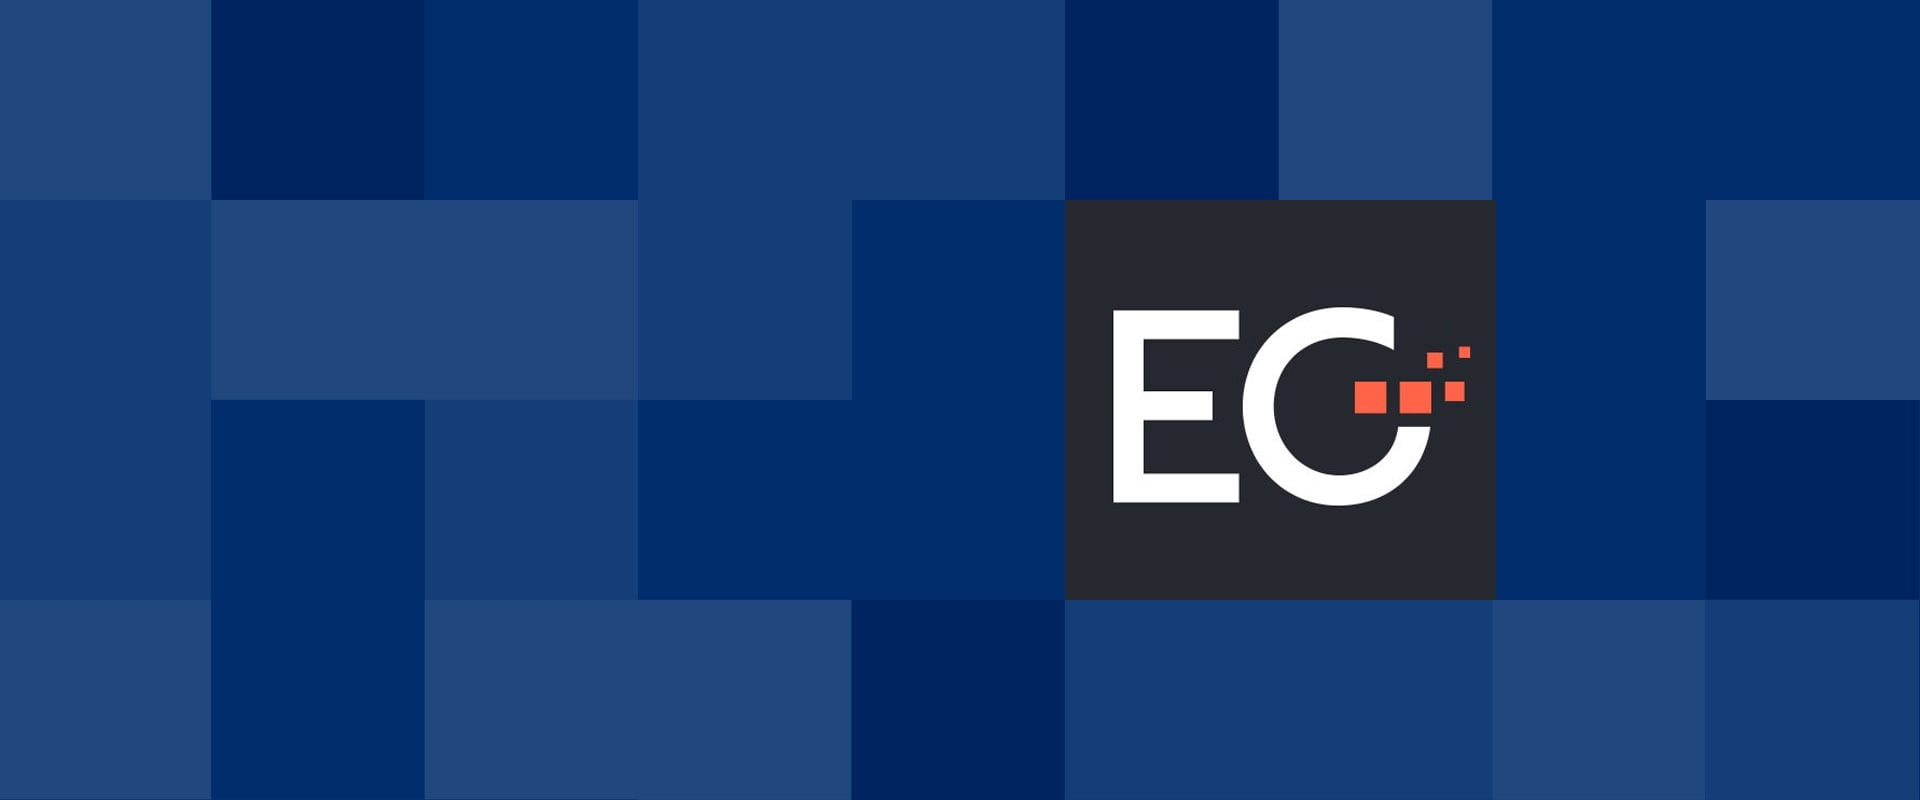 Environmental, Social, and Corporate Governance (ESG) and Net Zero